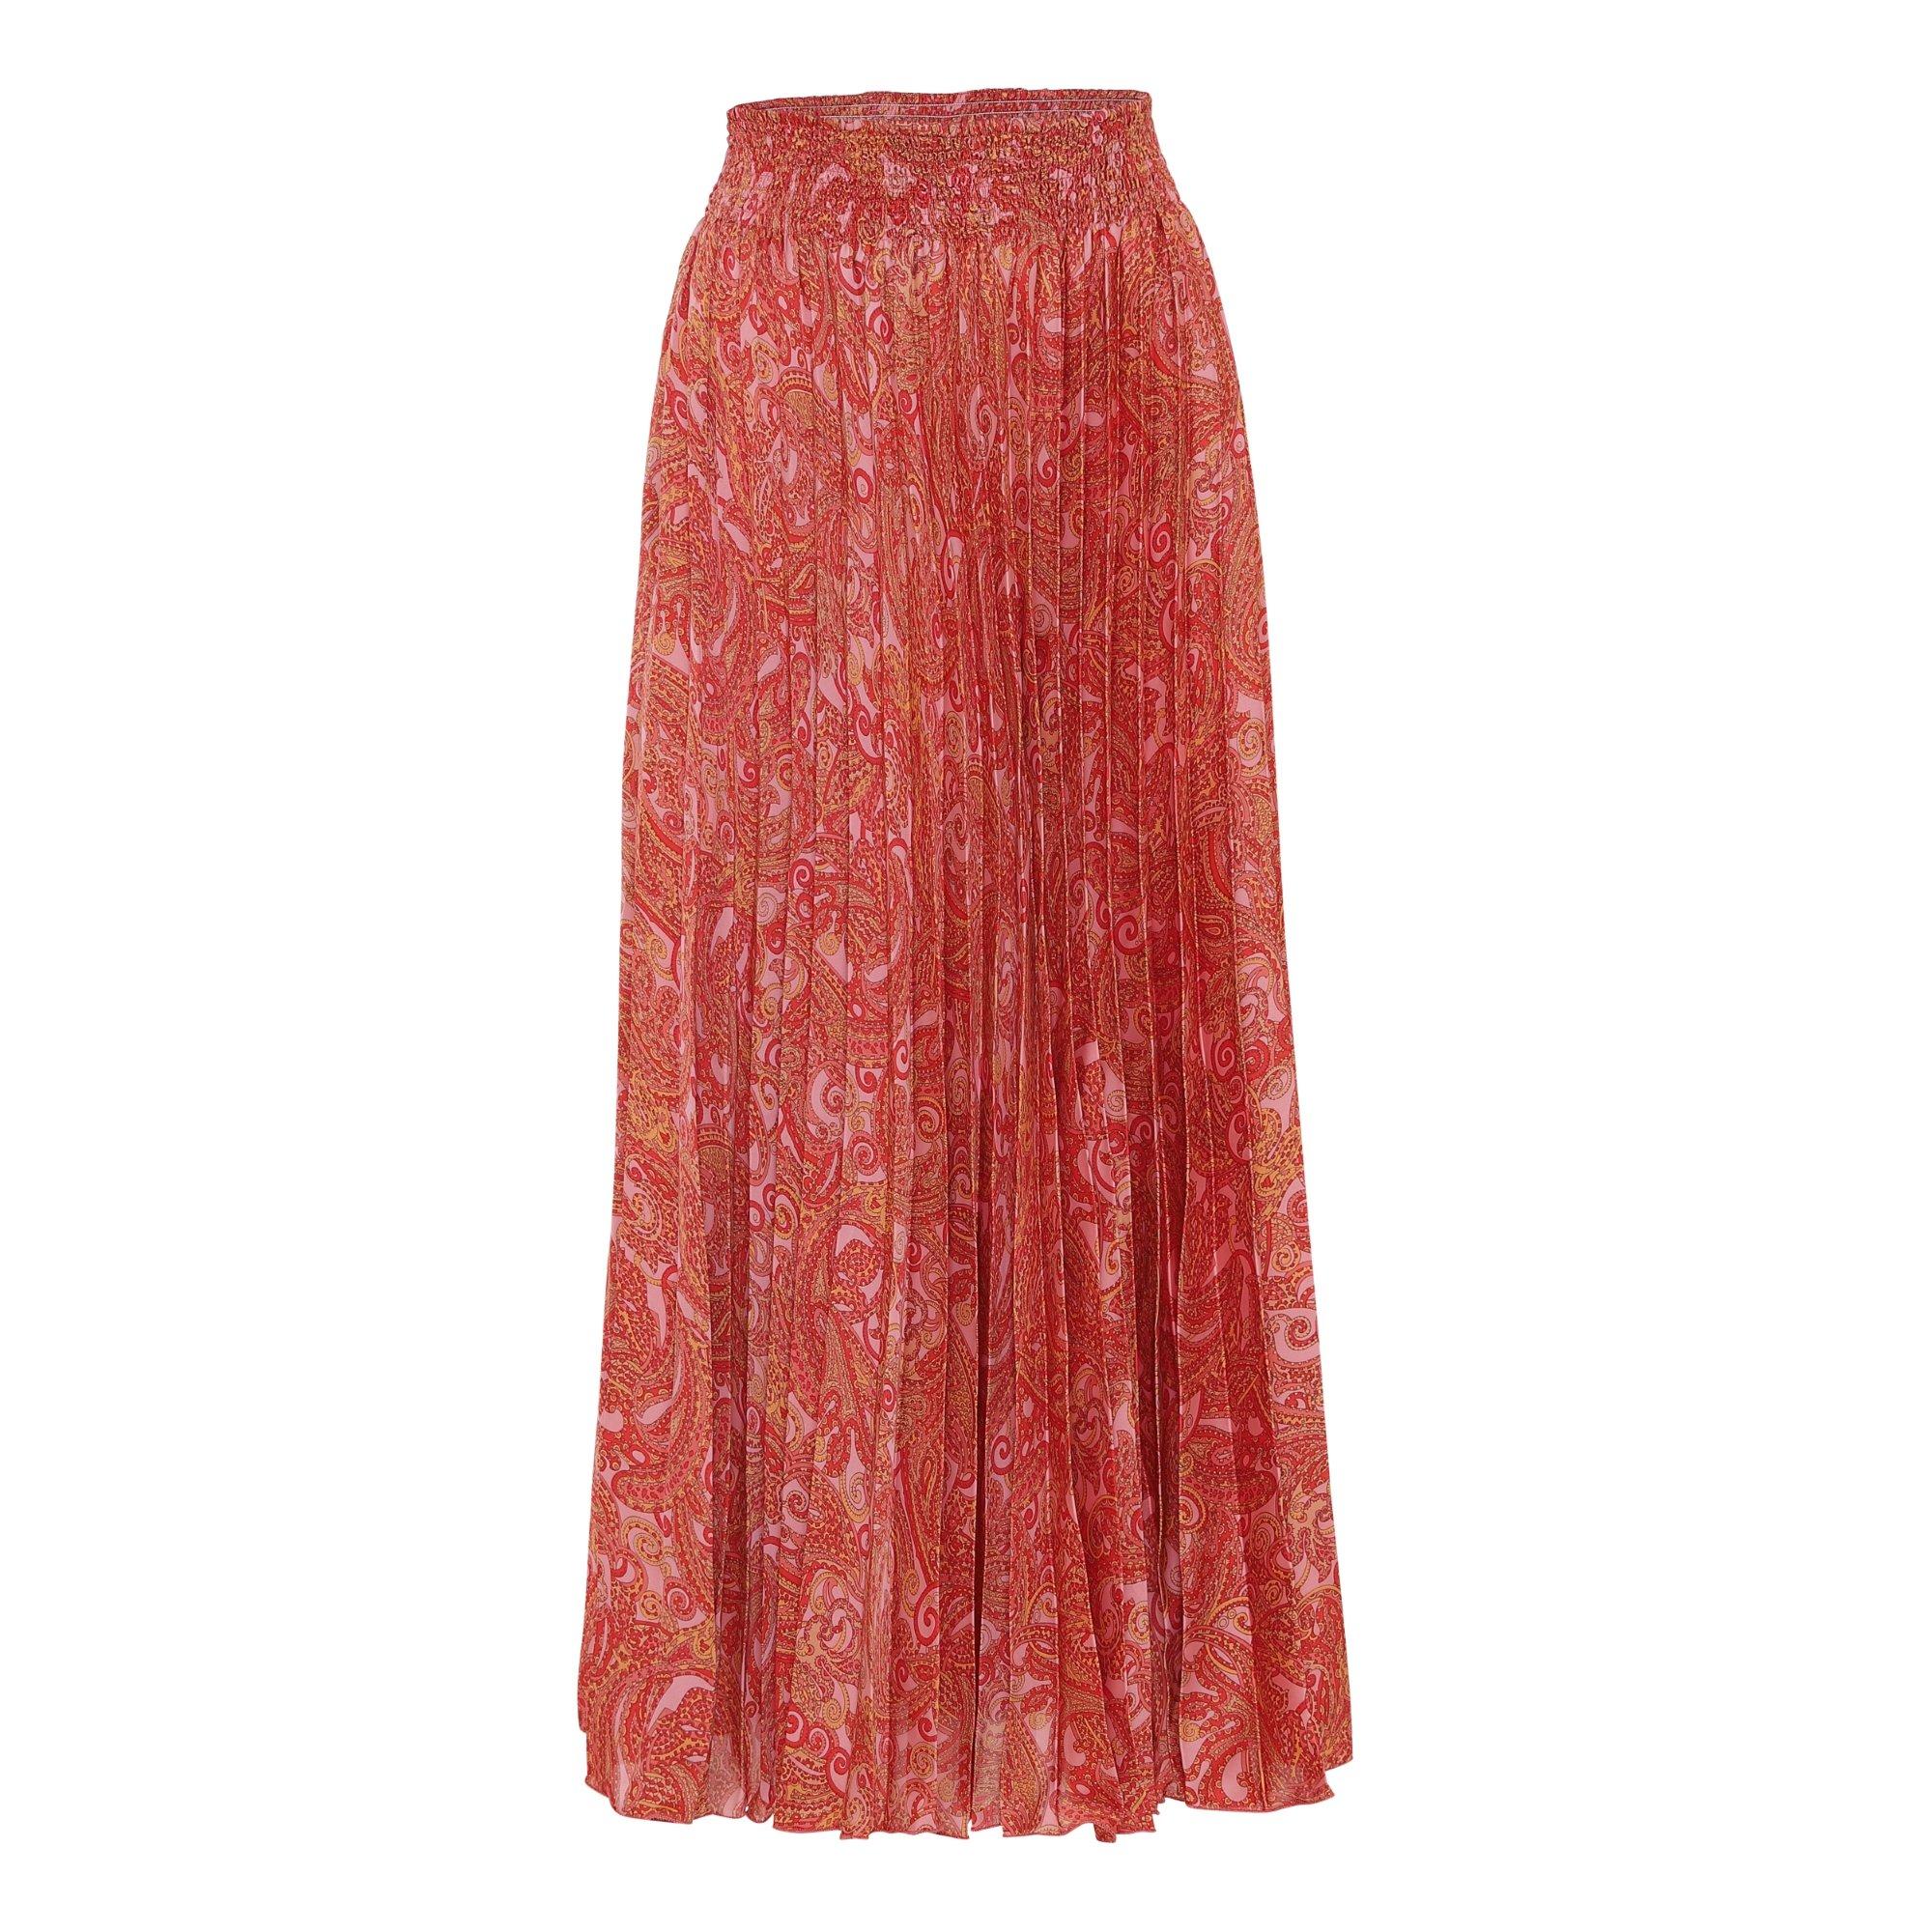 Karmamia Pink Paisley Plisse Skirt